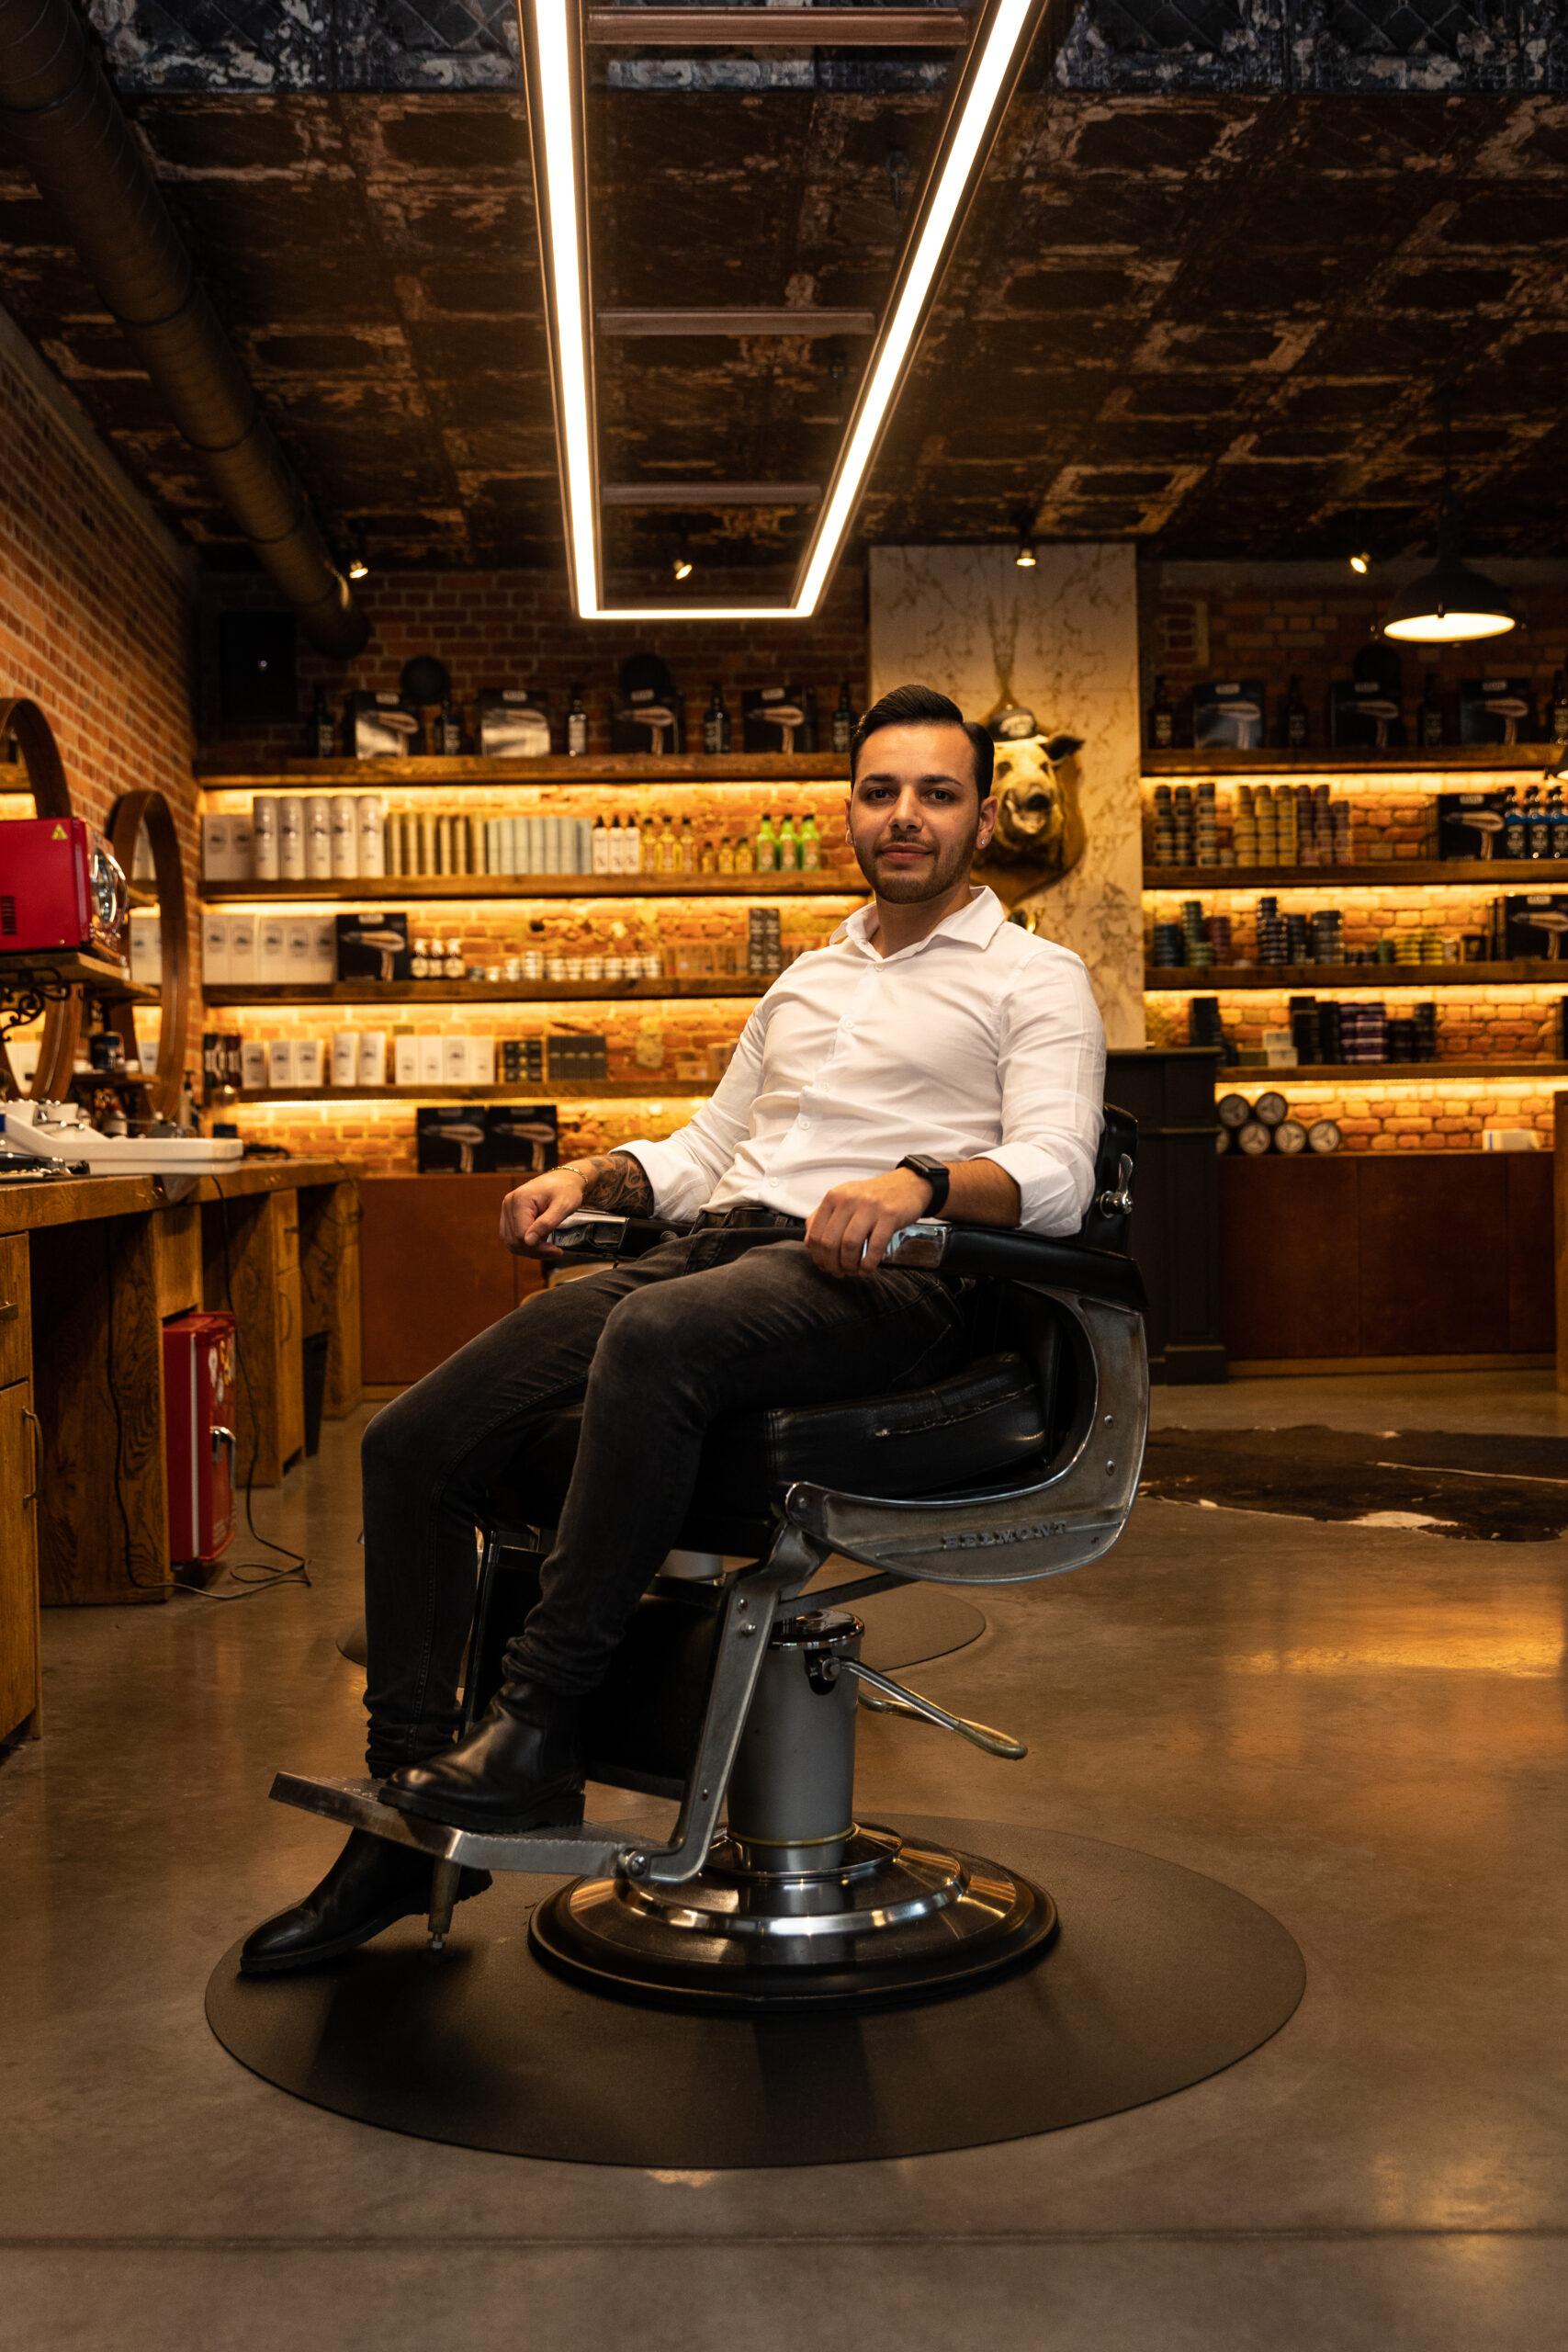 Jorges barbershop-2